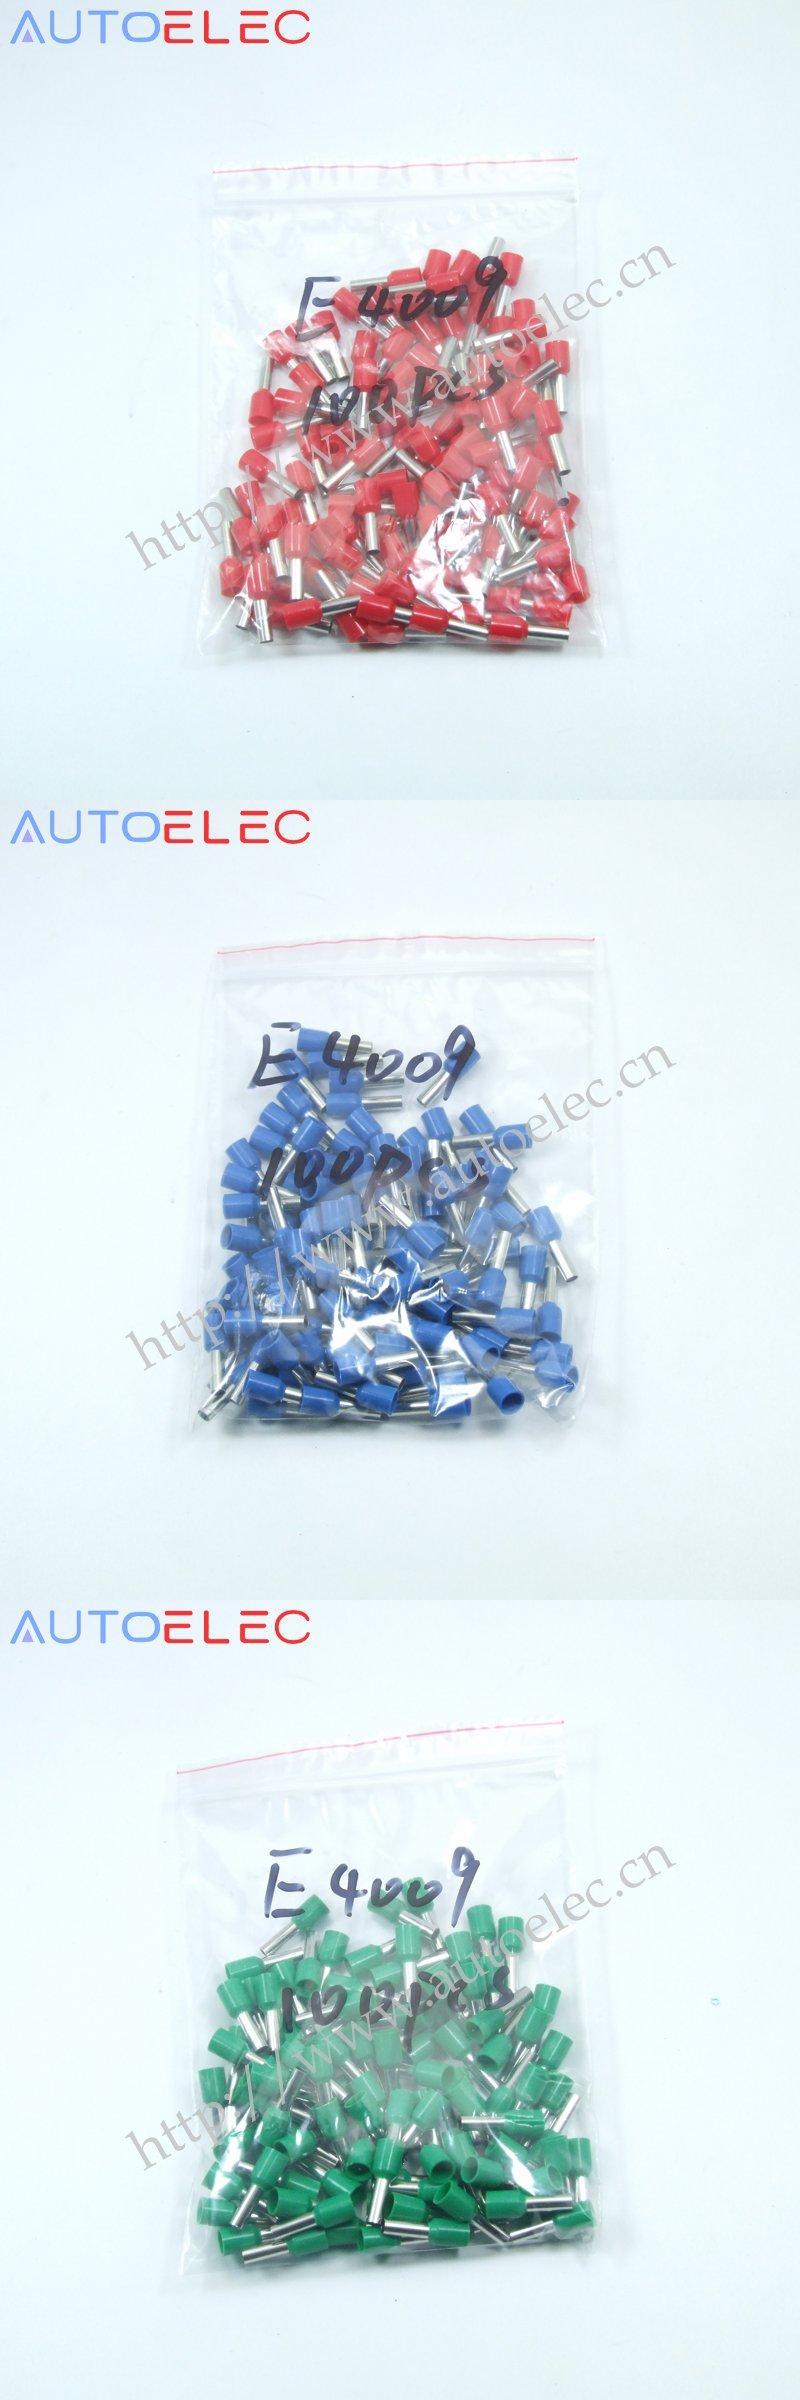 Visit to Buy] E4009 100pcs Ferrule Terminal Cord End Terminal AWG12 ...